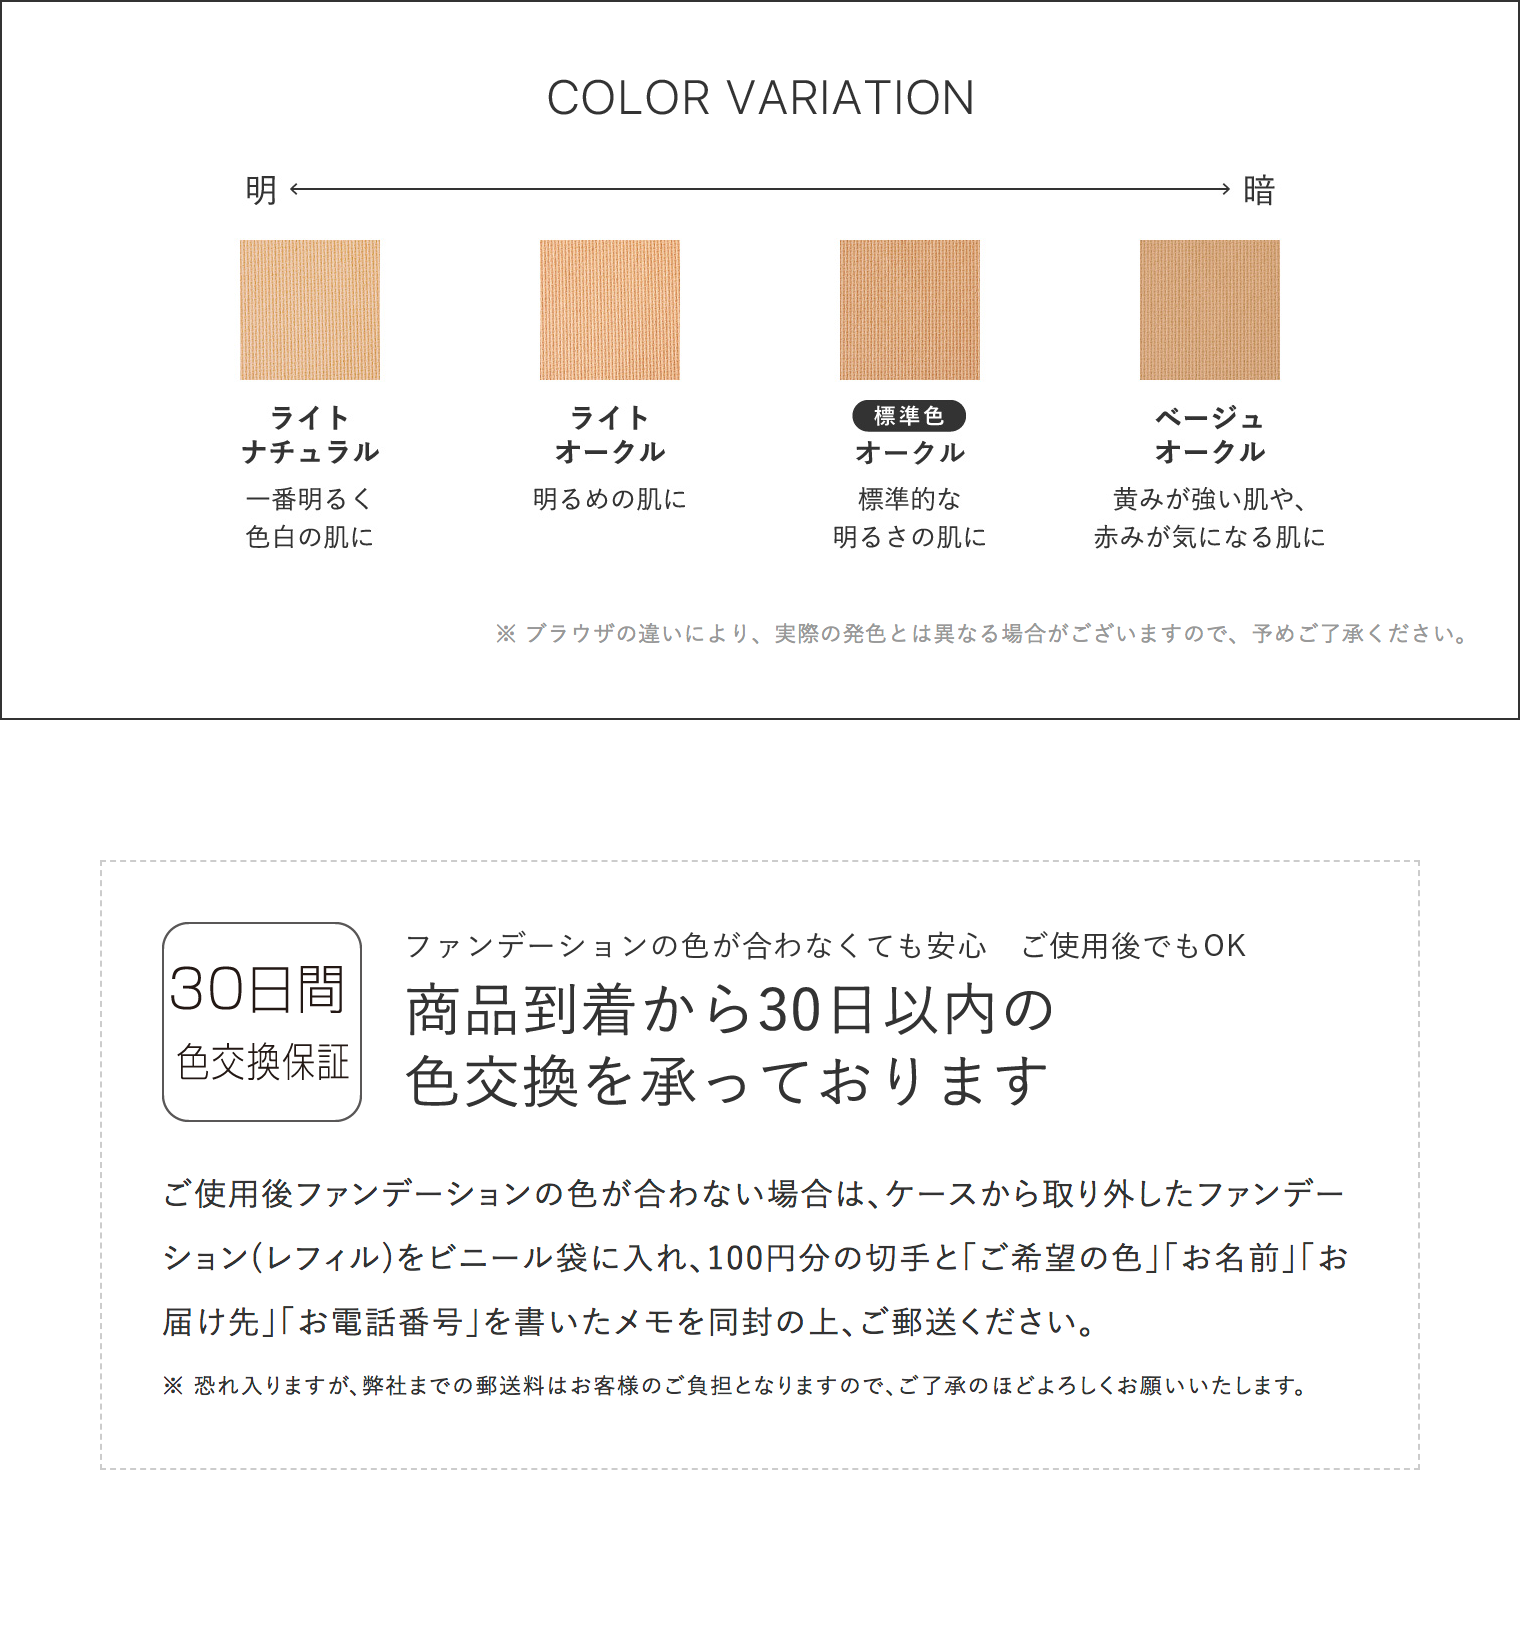 COLOR・30日間色交換保証